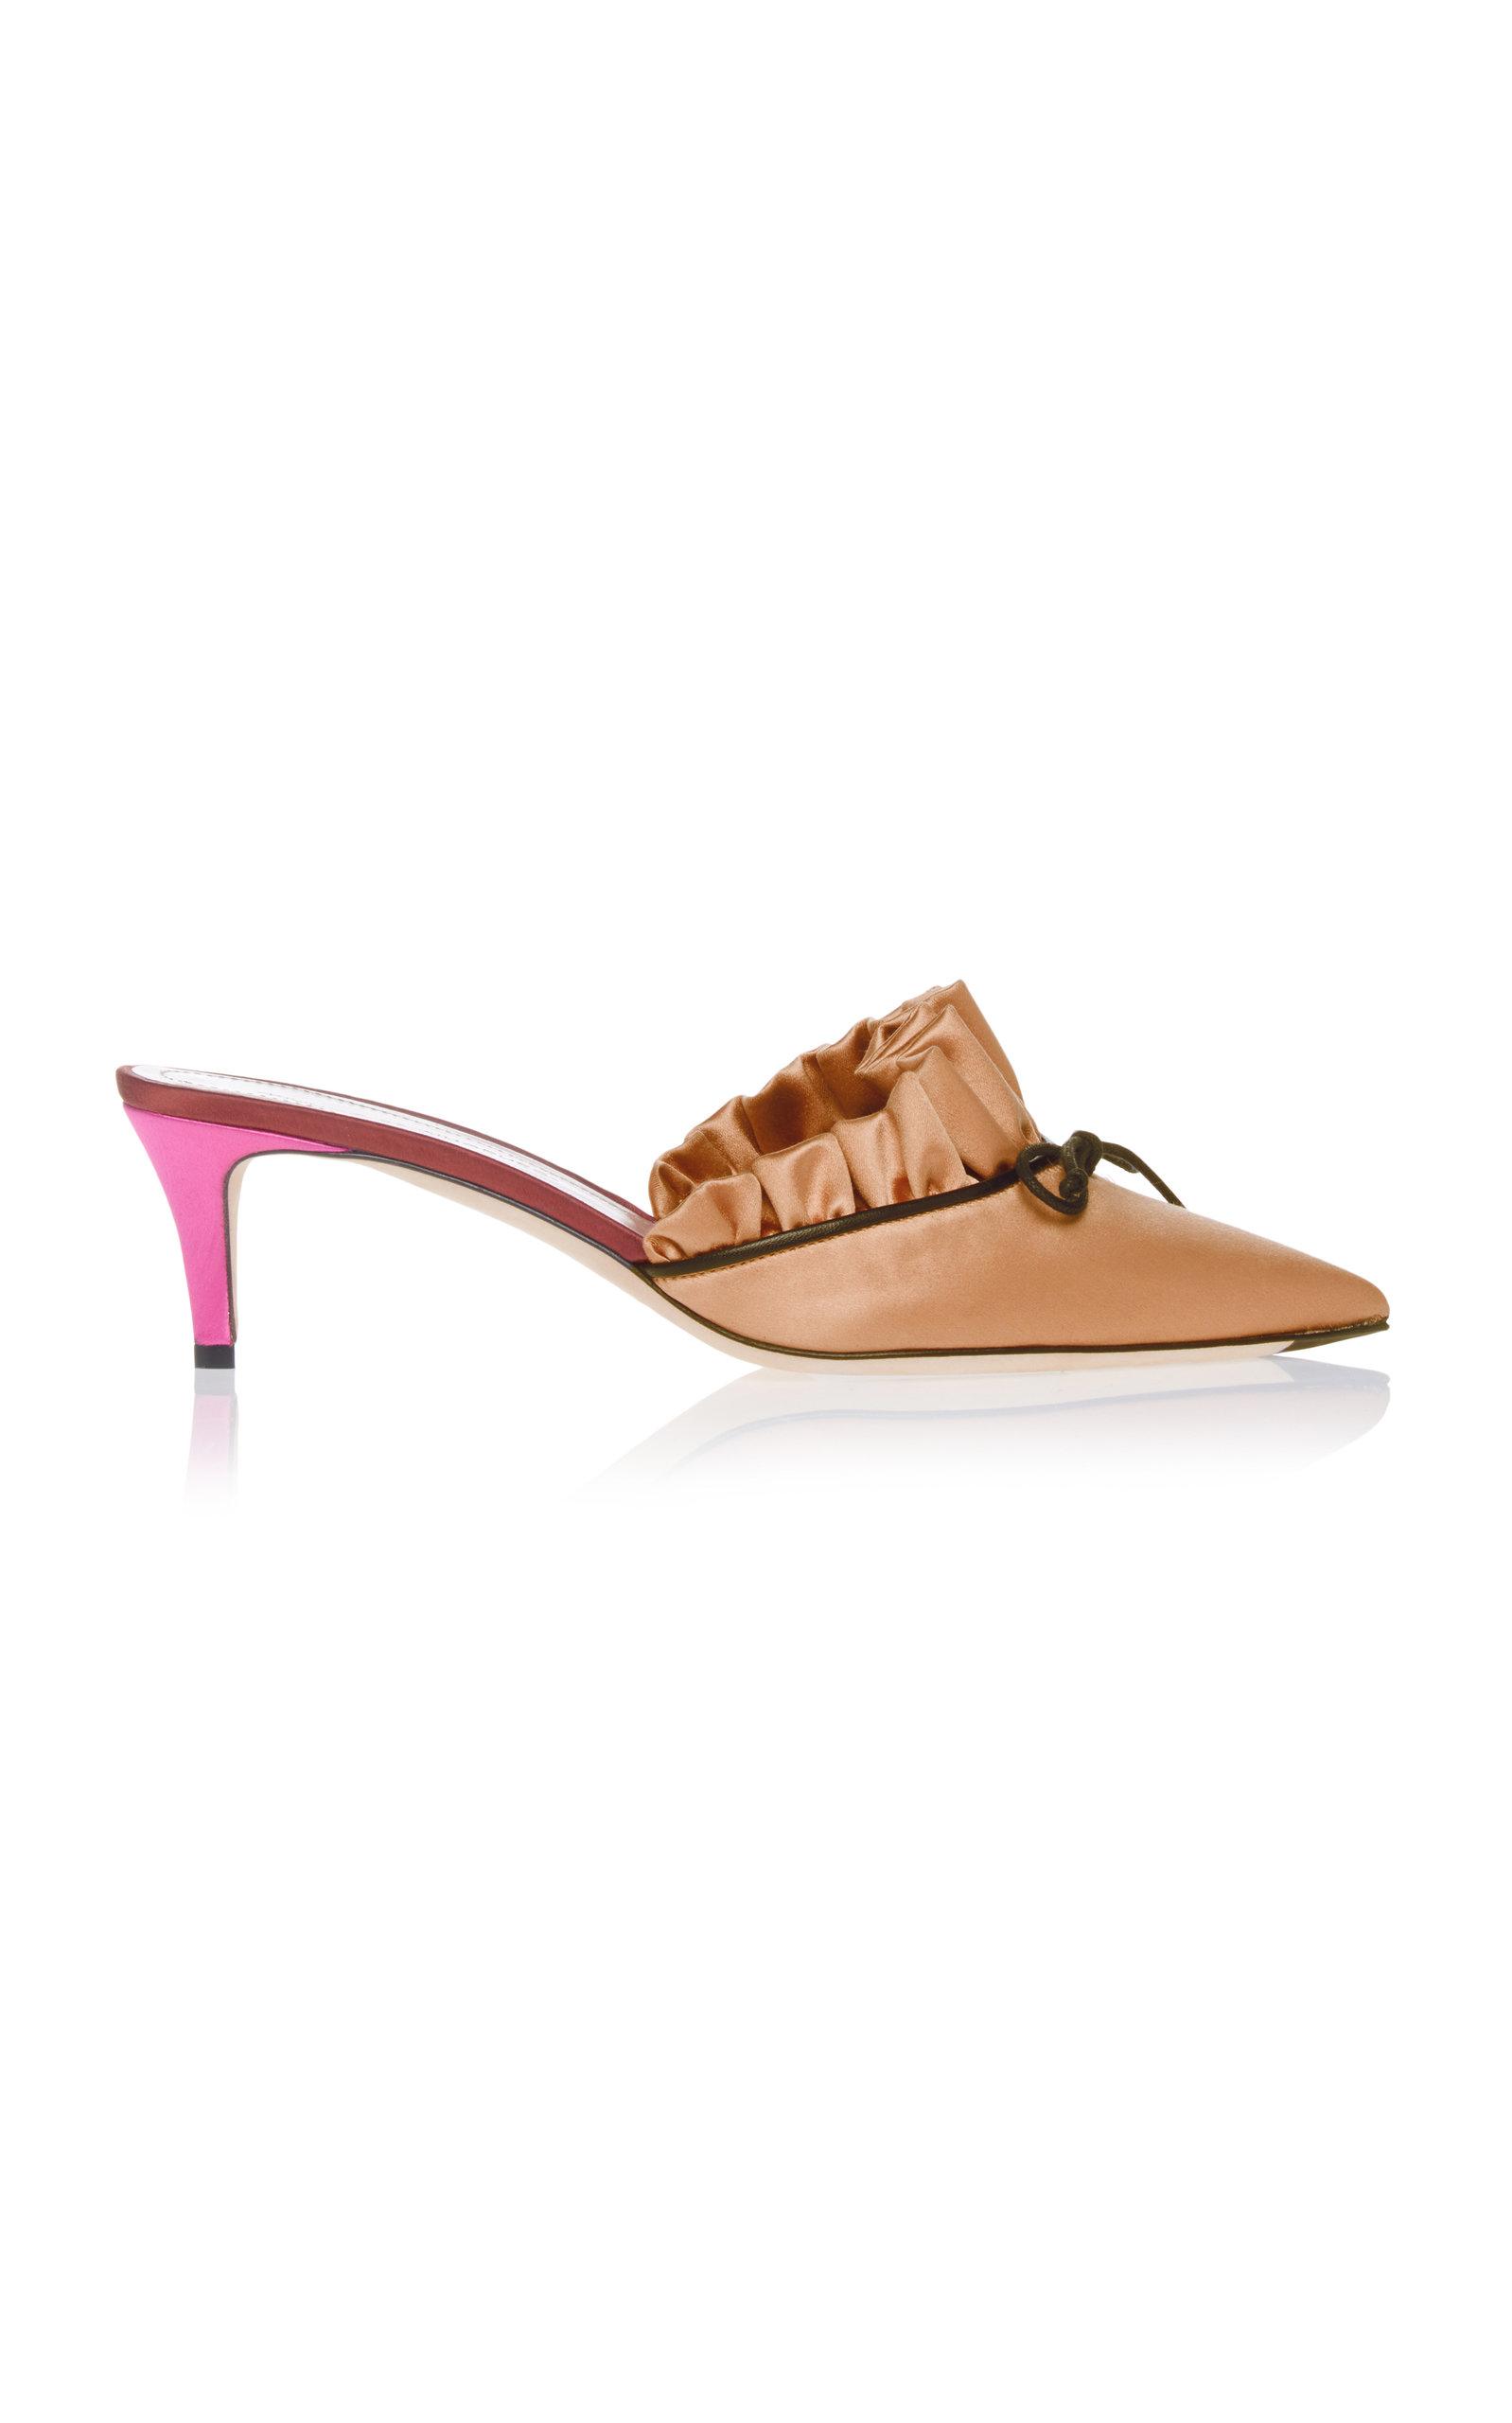 MARCO DE VINCENZO Point-toe bow-embellished satin mules Outlet Ebay dCSN6K